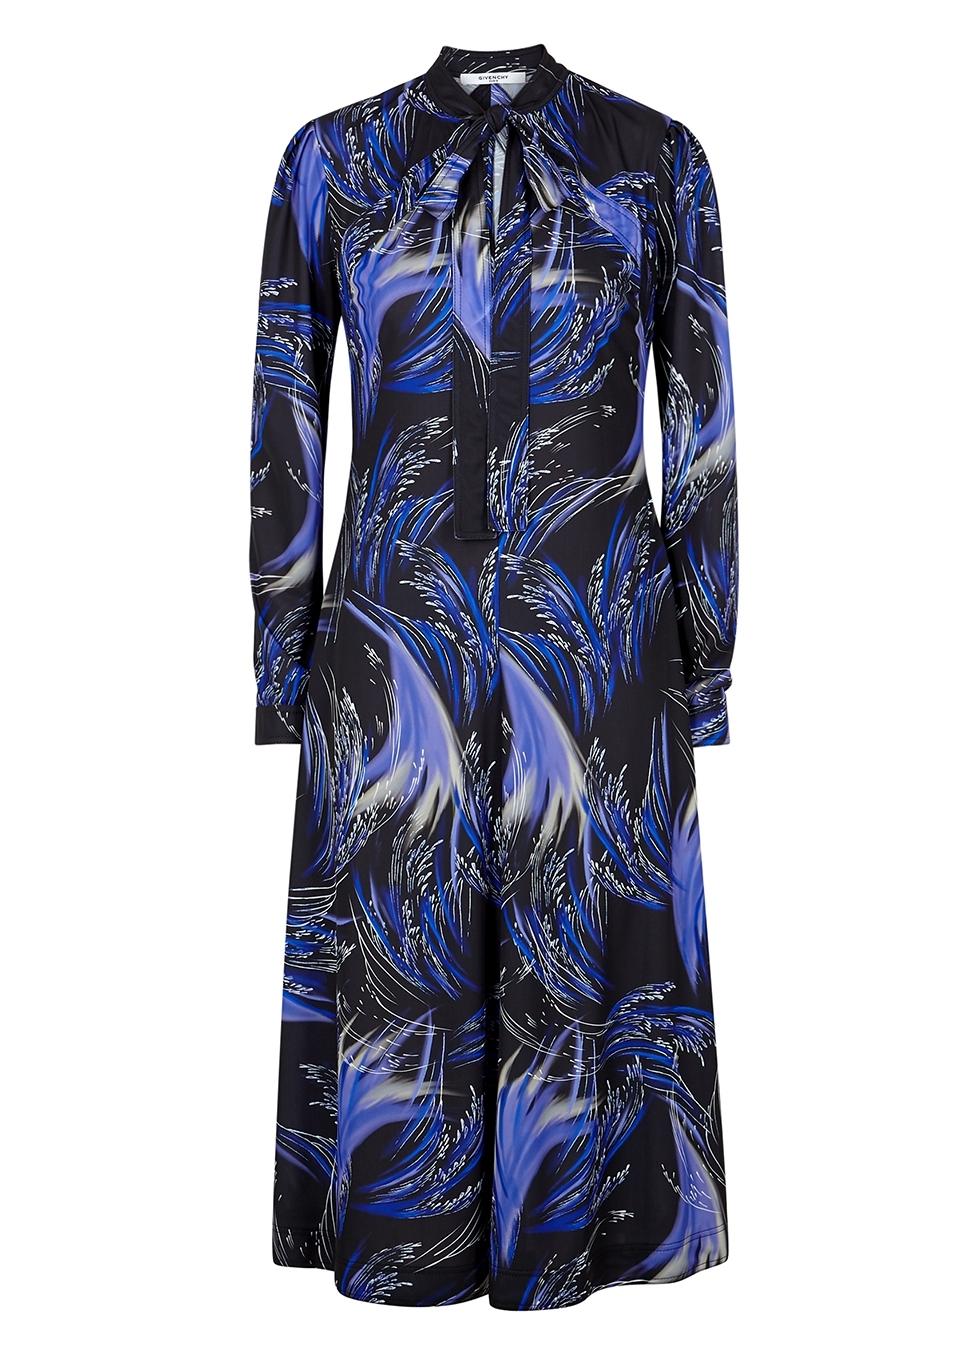 1584a980c3a Givenchy Womens - Harvey Nichols